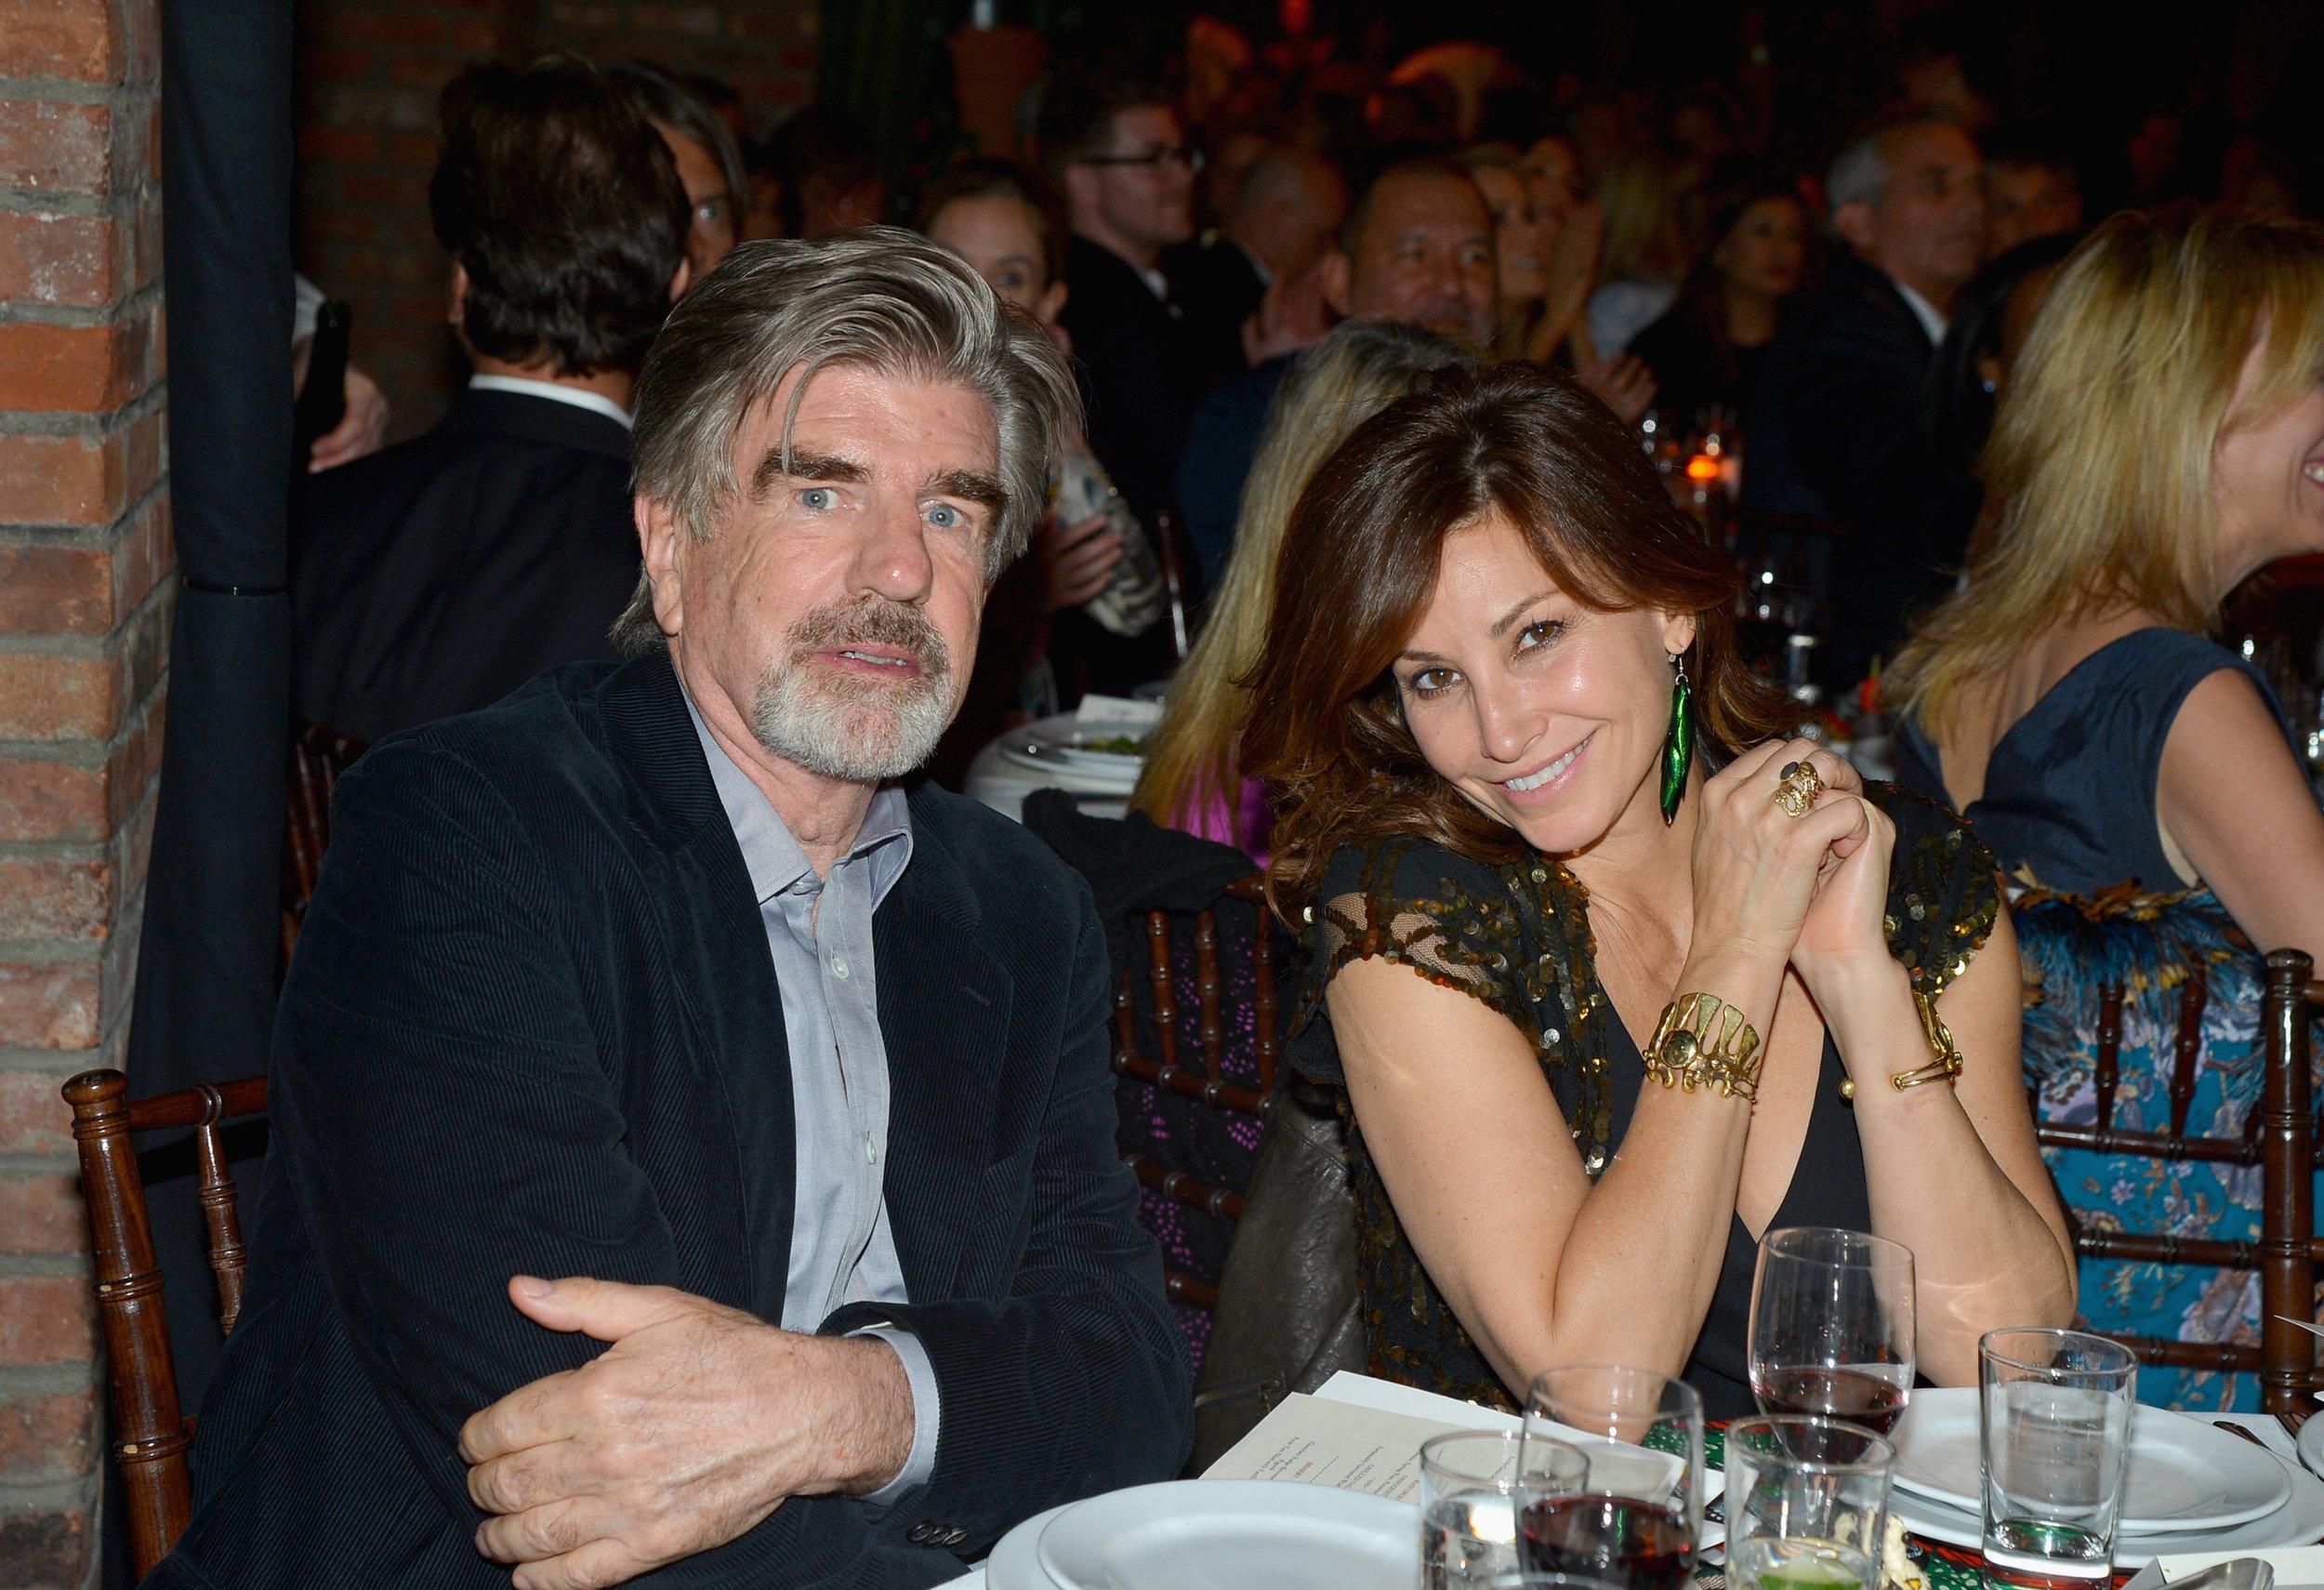 Tom Freston and Gina Gershon